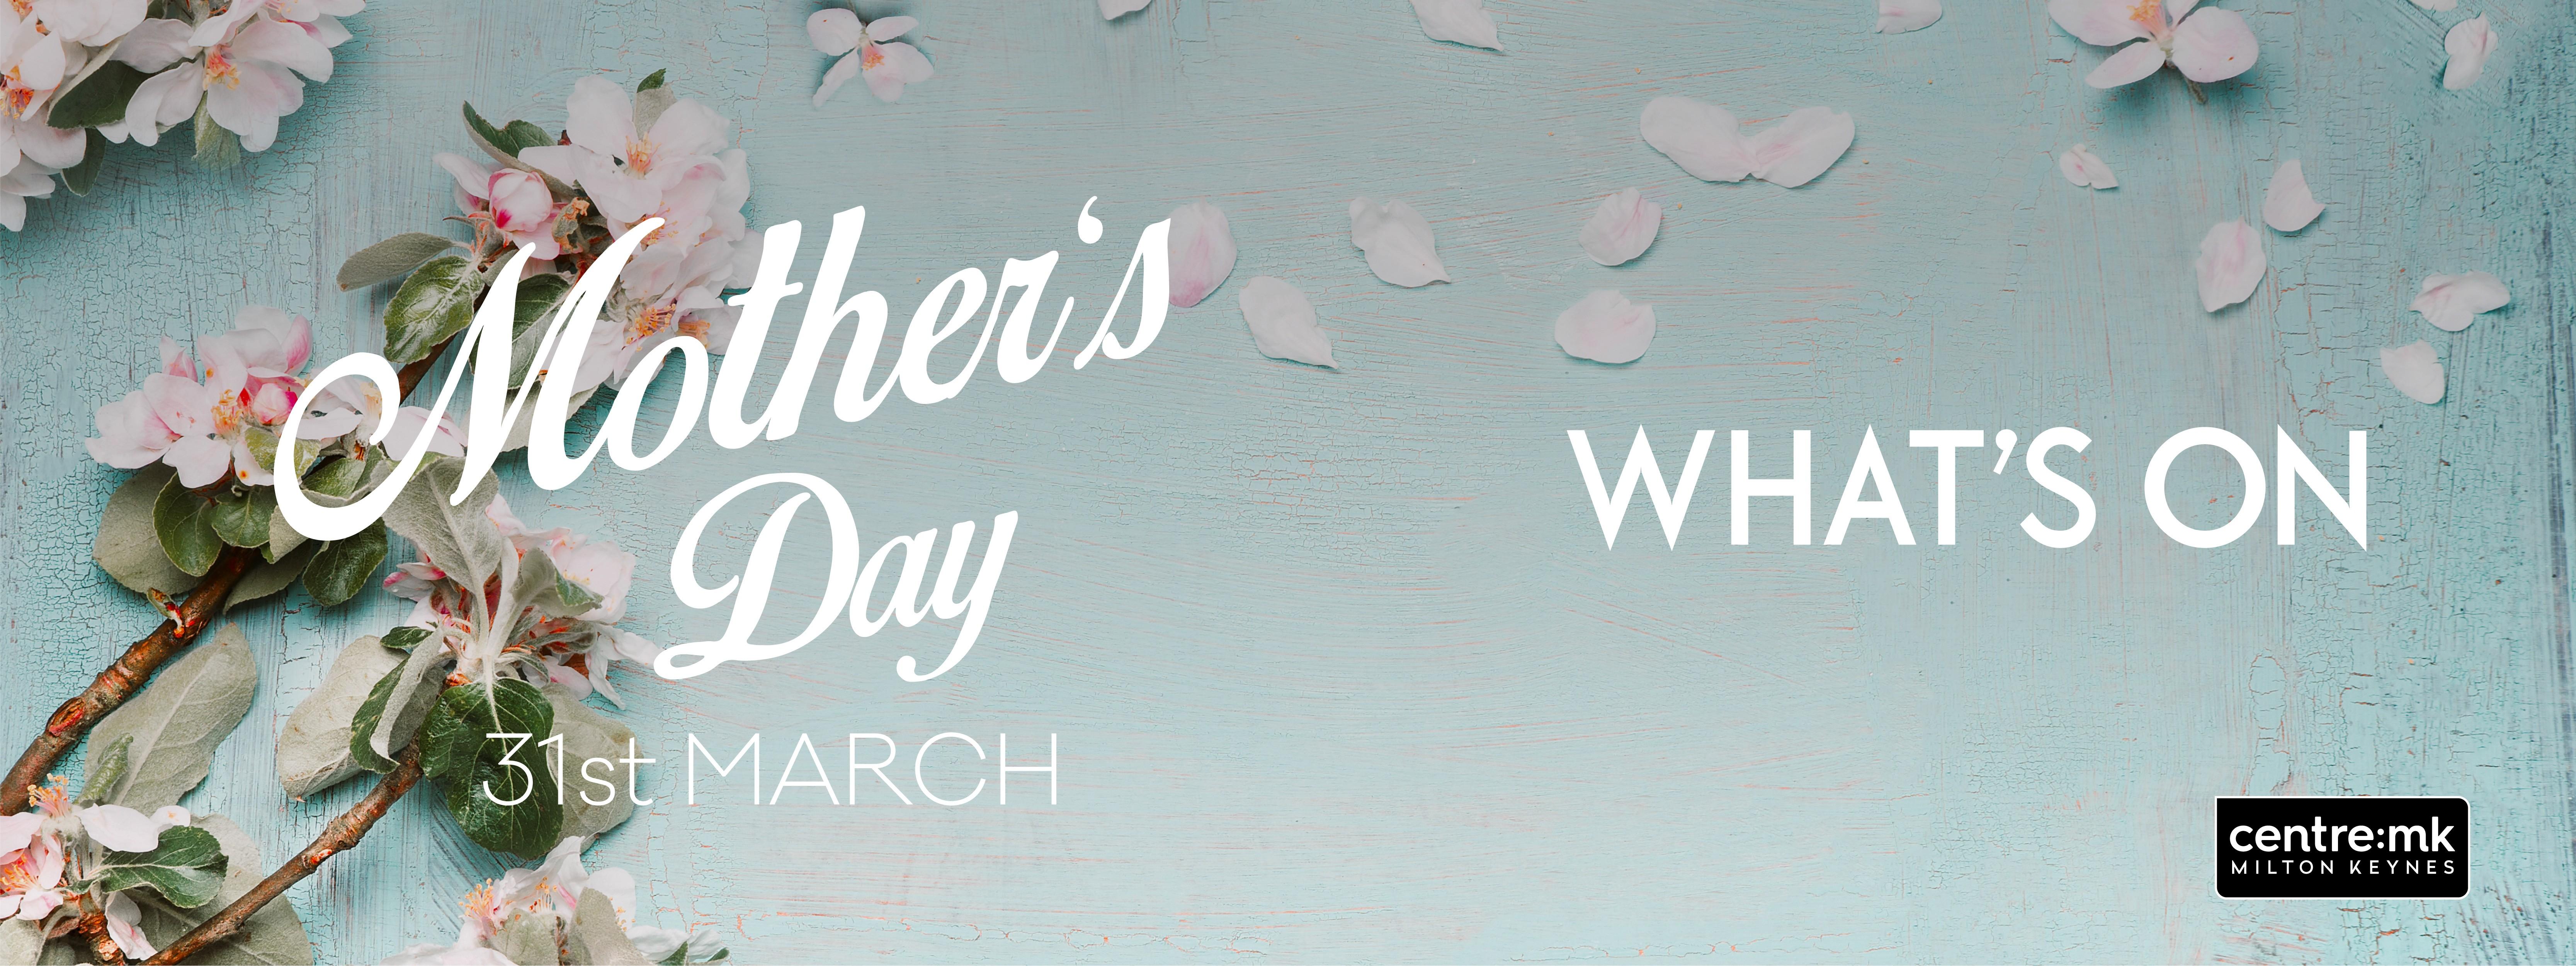 d2b99a33b5f What s on this Mother s Day at centre mk - Centre MK - The Largest Shopping  Centre in Milton Keynes